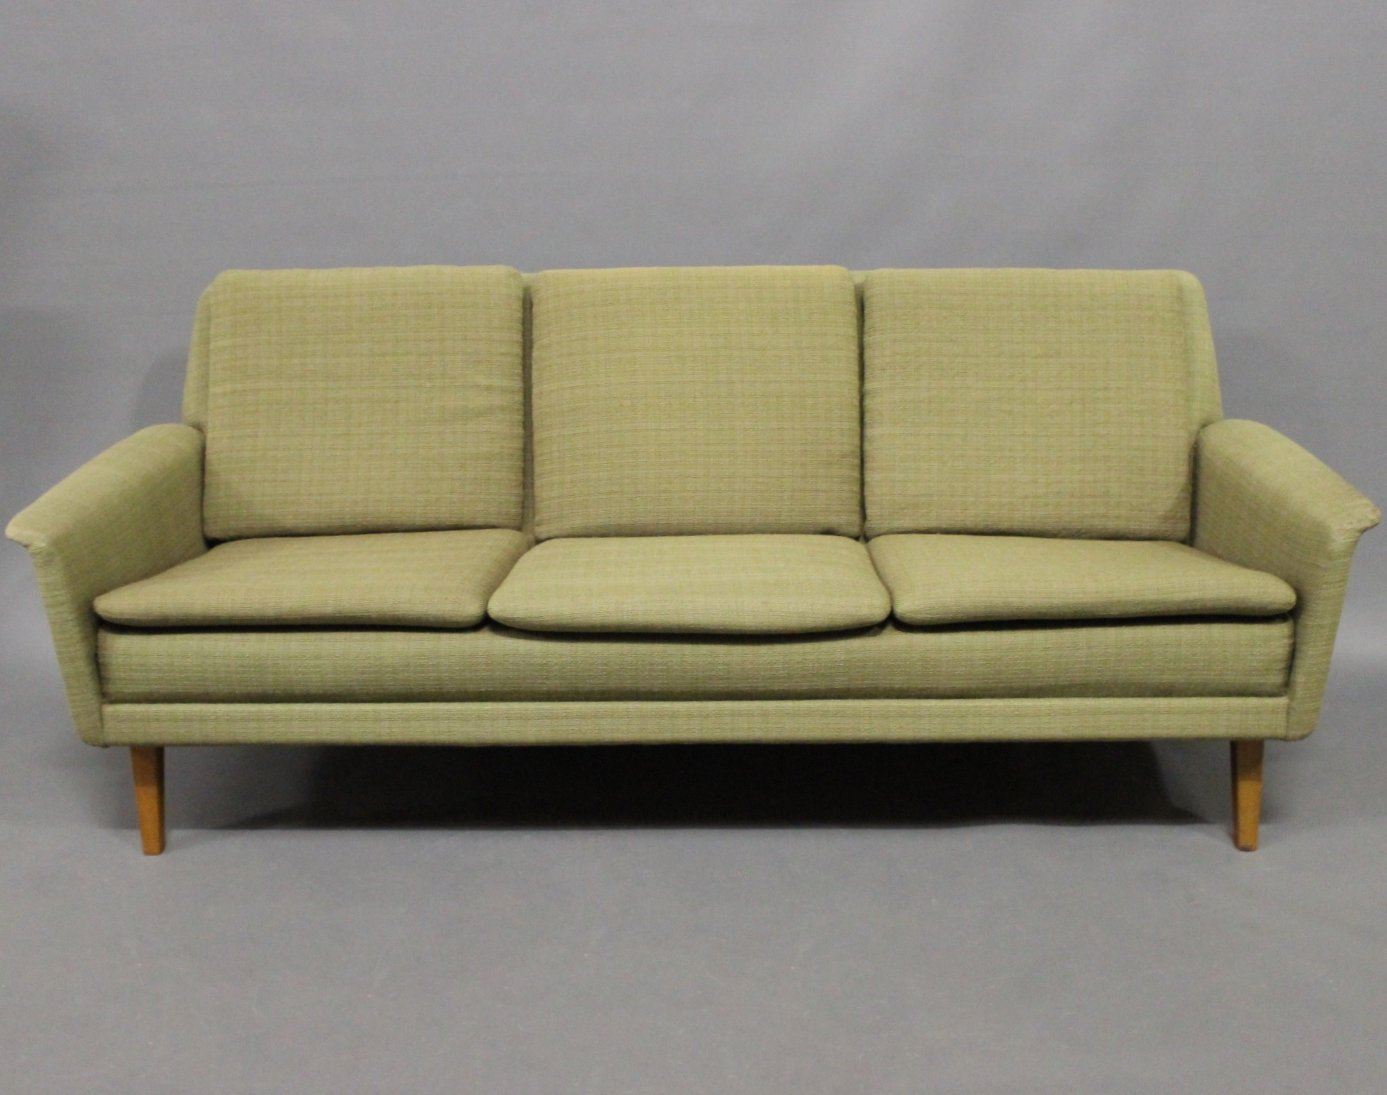 3 sitzer dux sofa von folke ohlsson f r fritz hansen. Black Bedroom Furniture Sets. Home Design Ideas